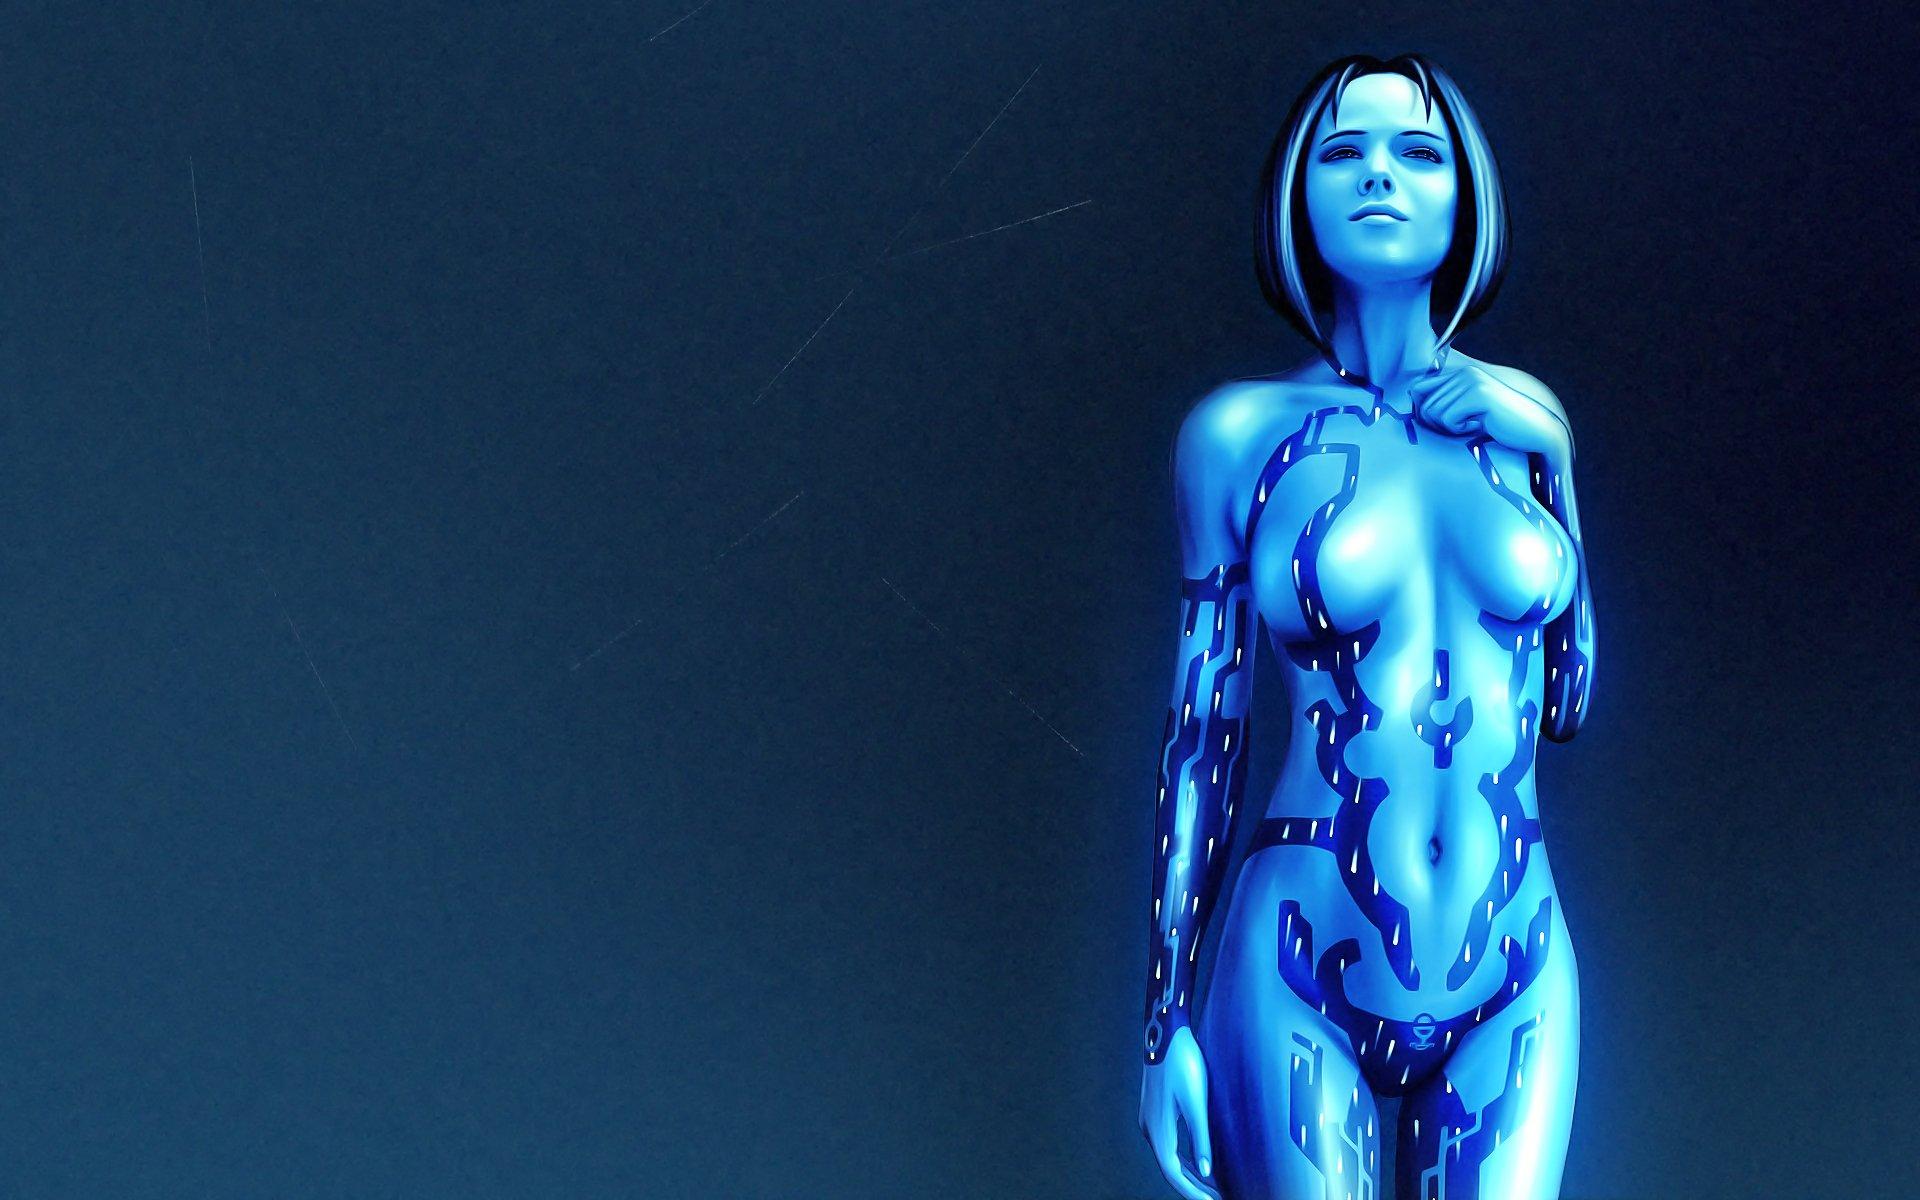 电子游戏 - 光晕  Cortana (Halo) Hologram 壁纸